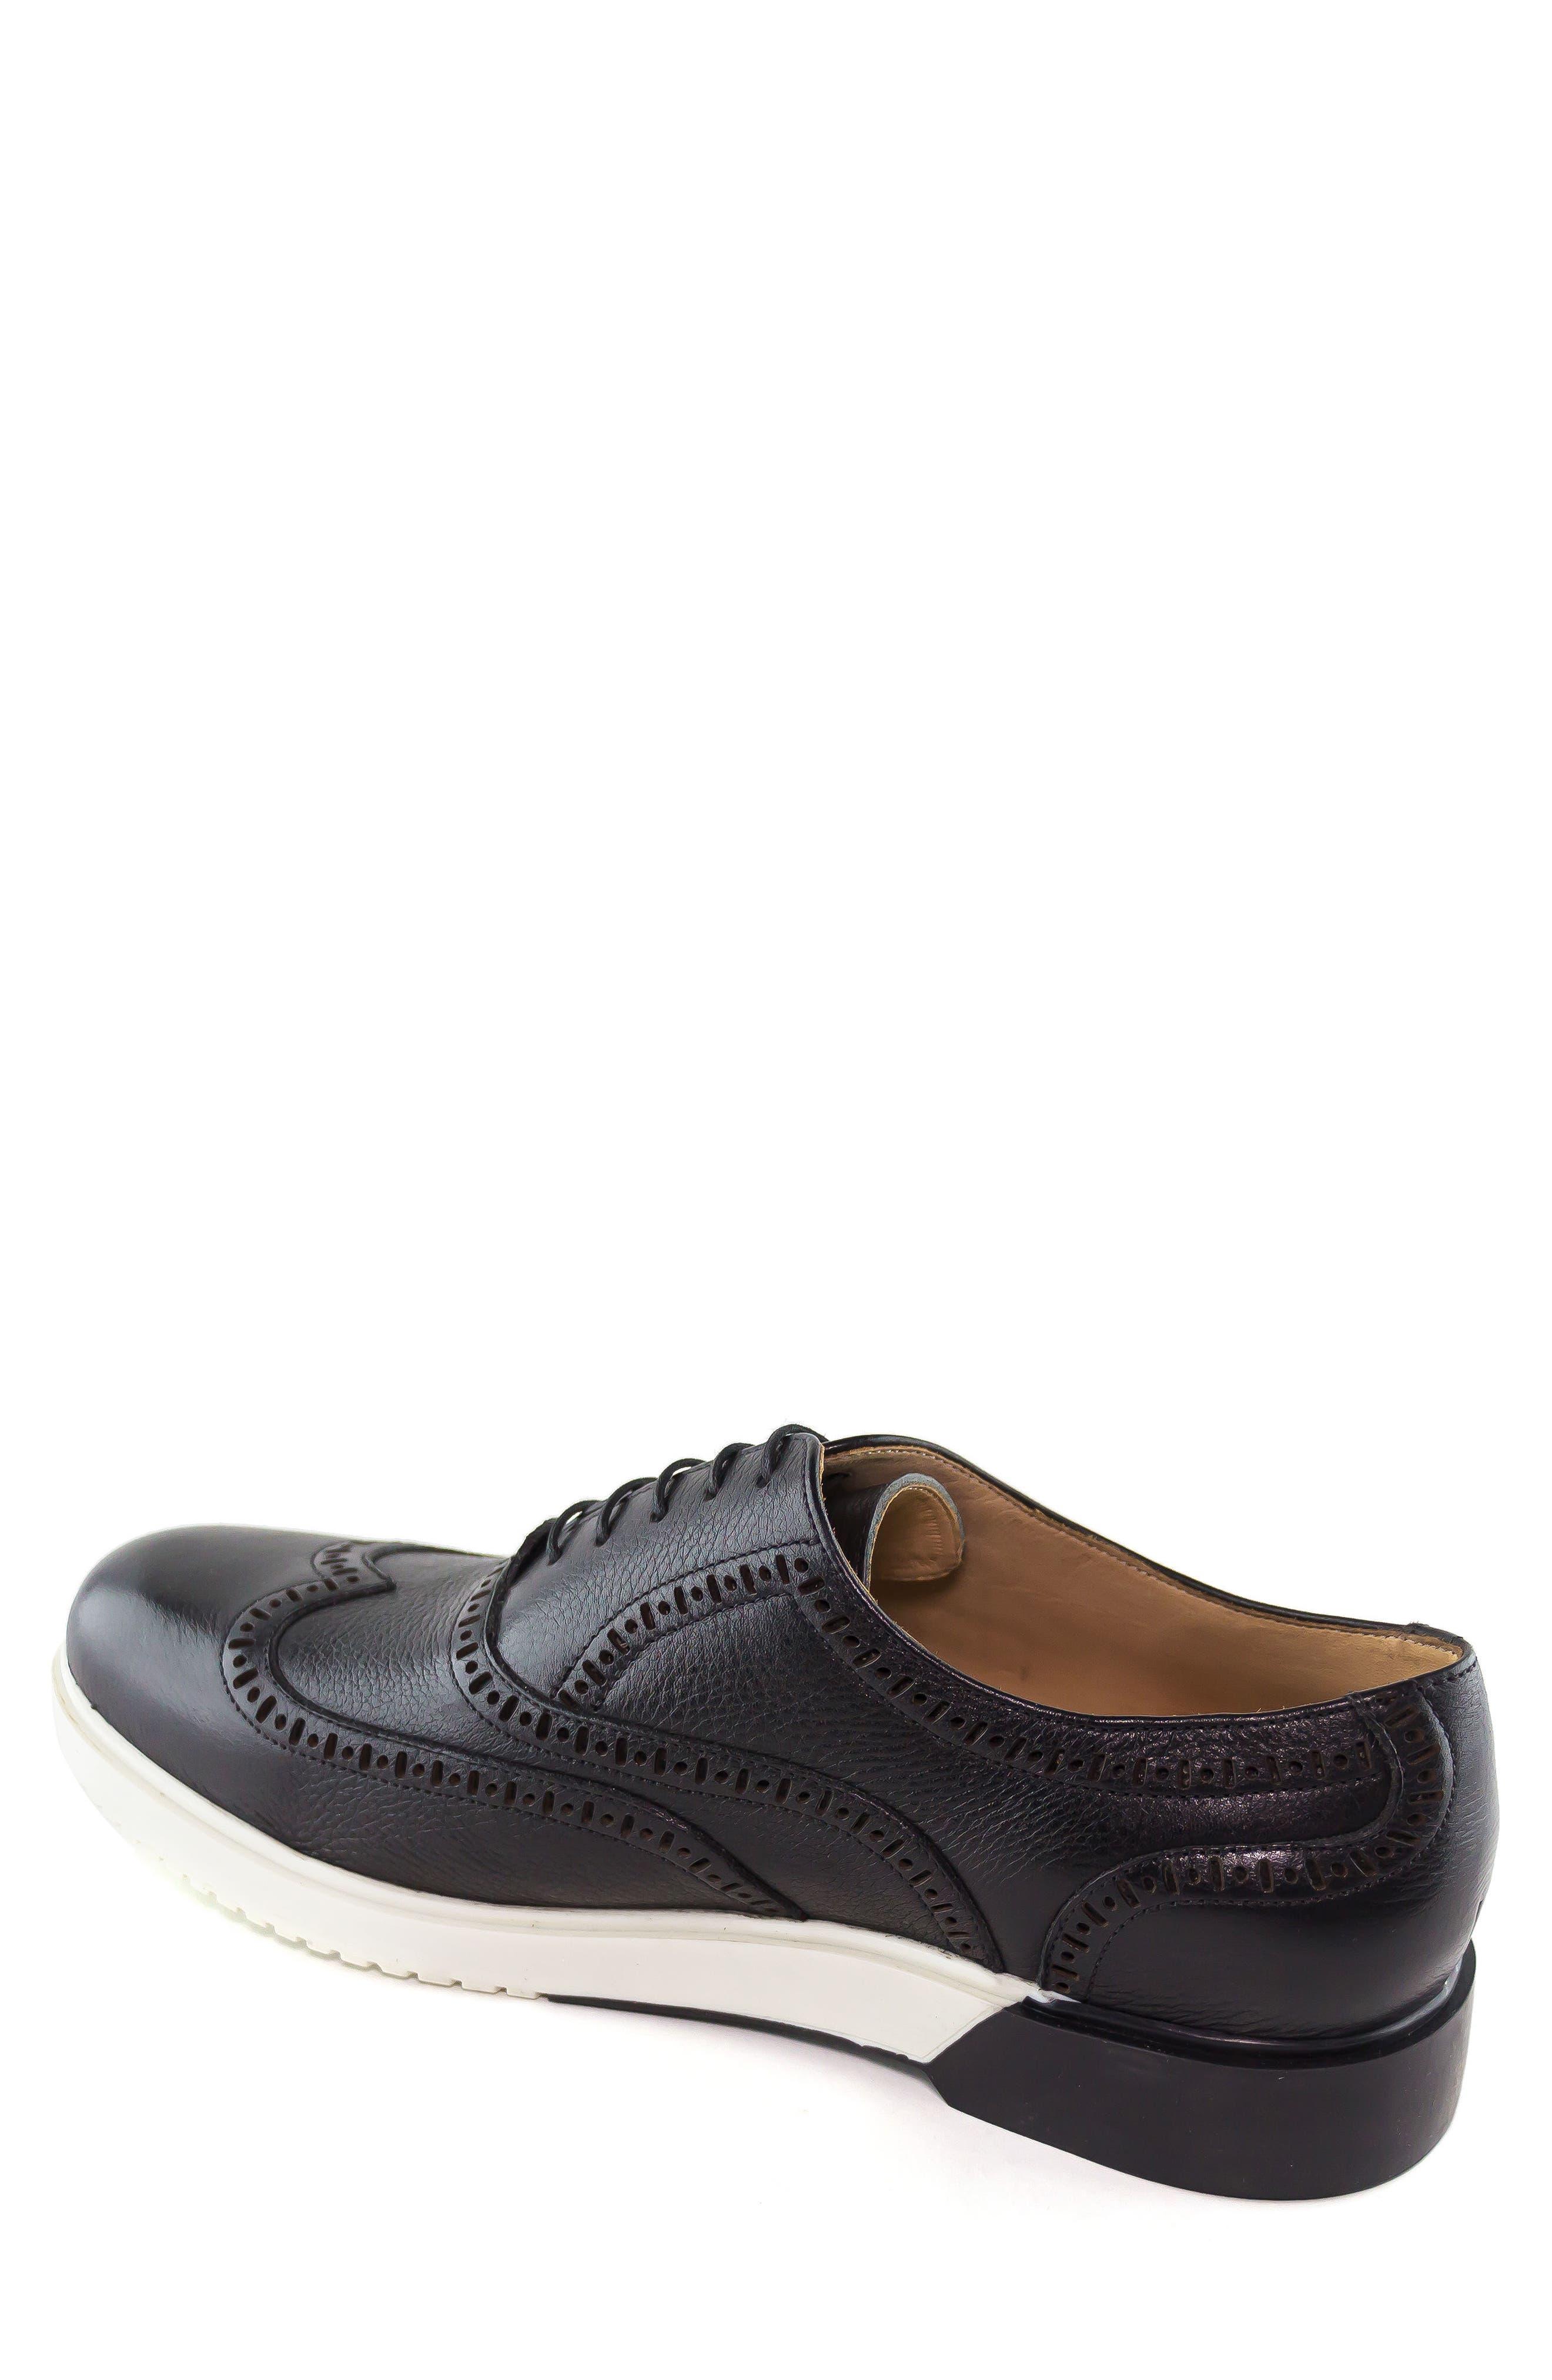 MARC JOSEPH NEW YORK, 5th Ave Wingtip Sneaker, Alternate thumbnail 2, color, 001